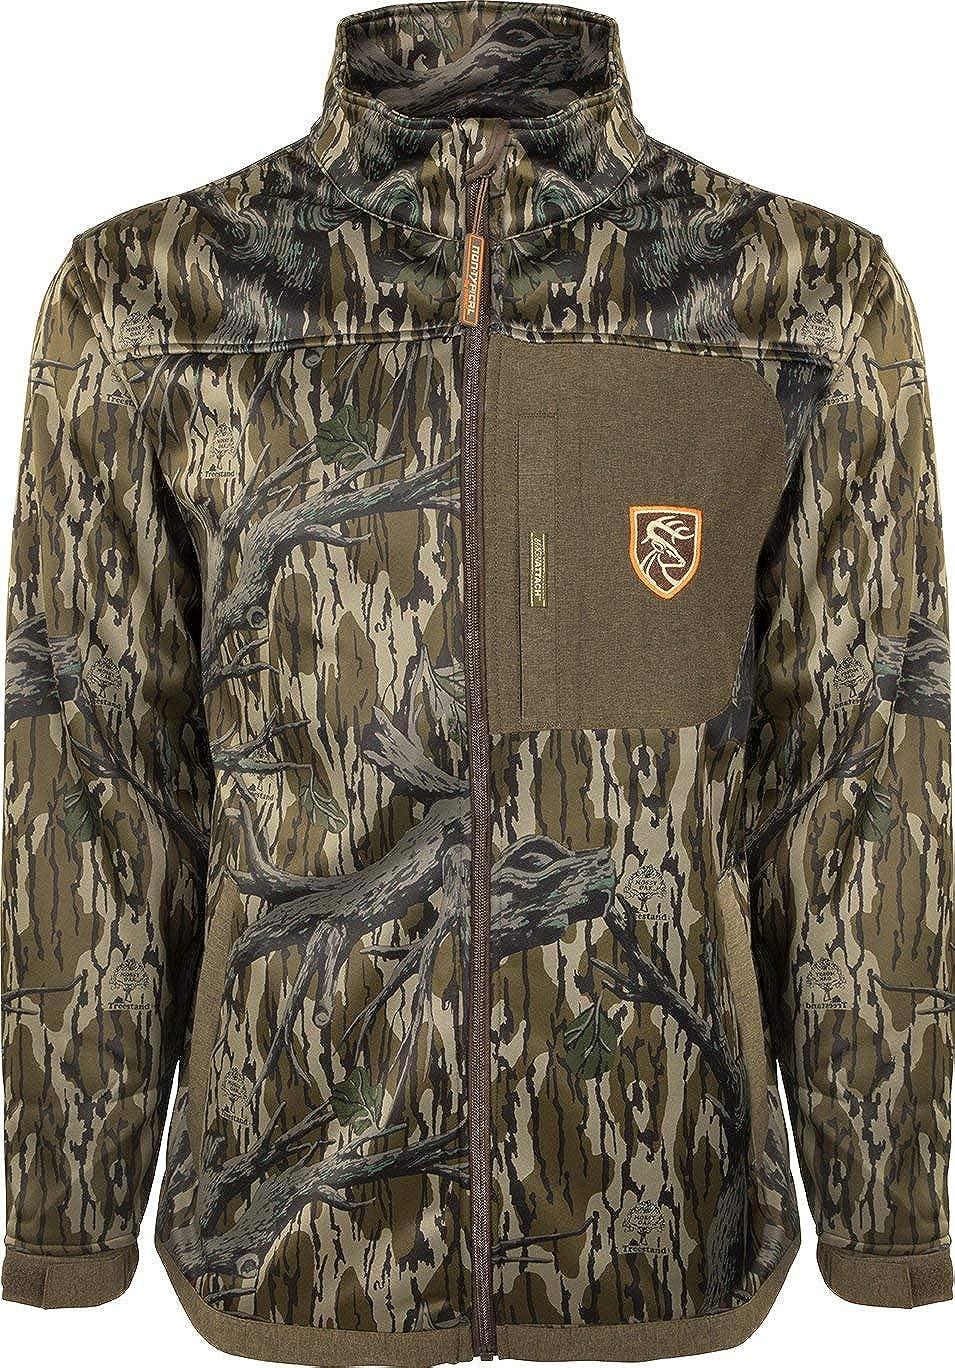 Drake Endurance Full Zip Jacket with Agion